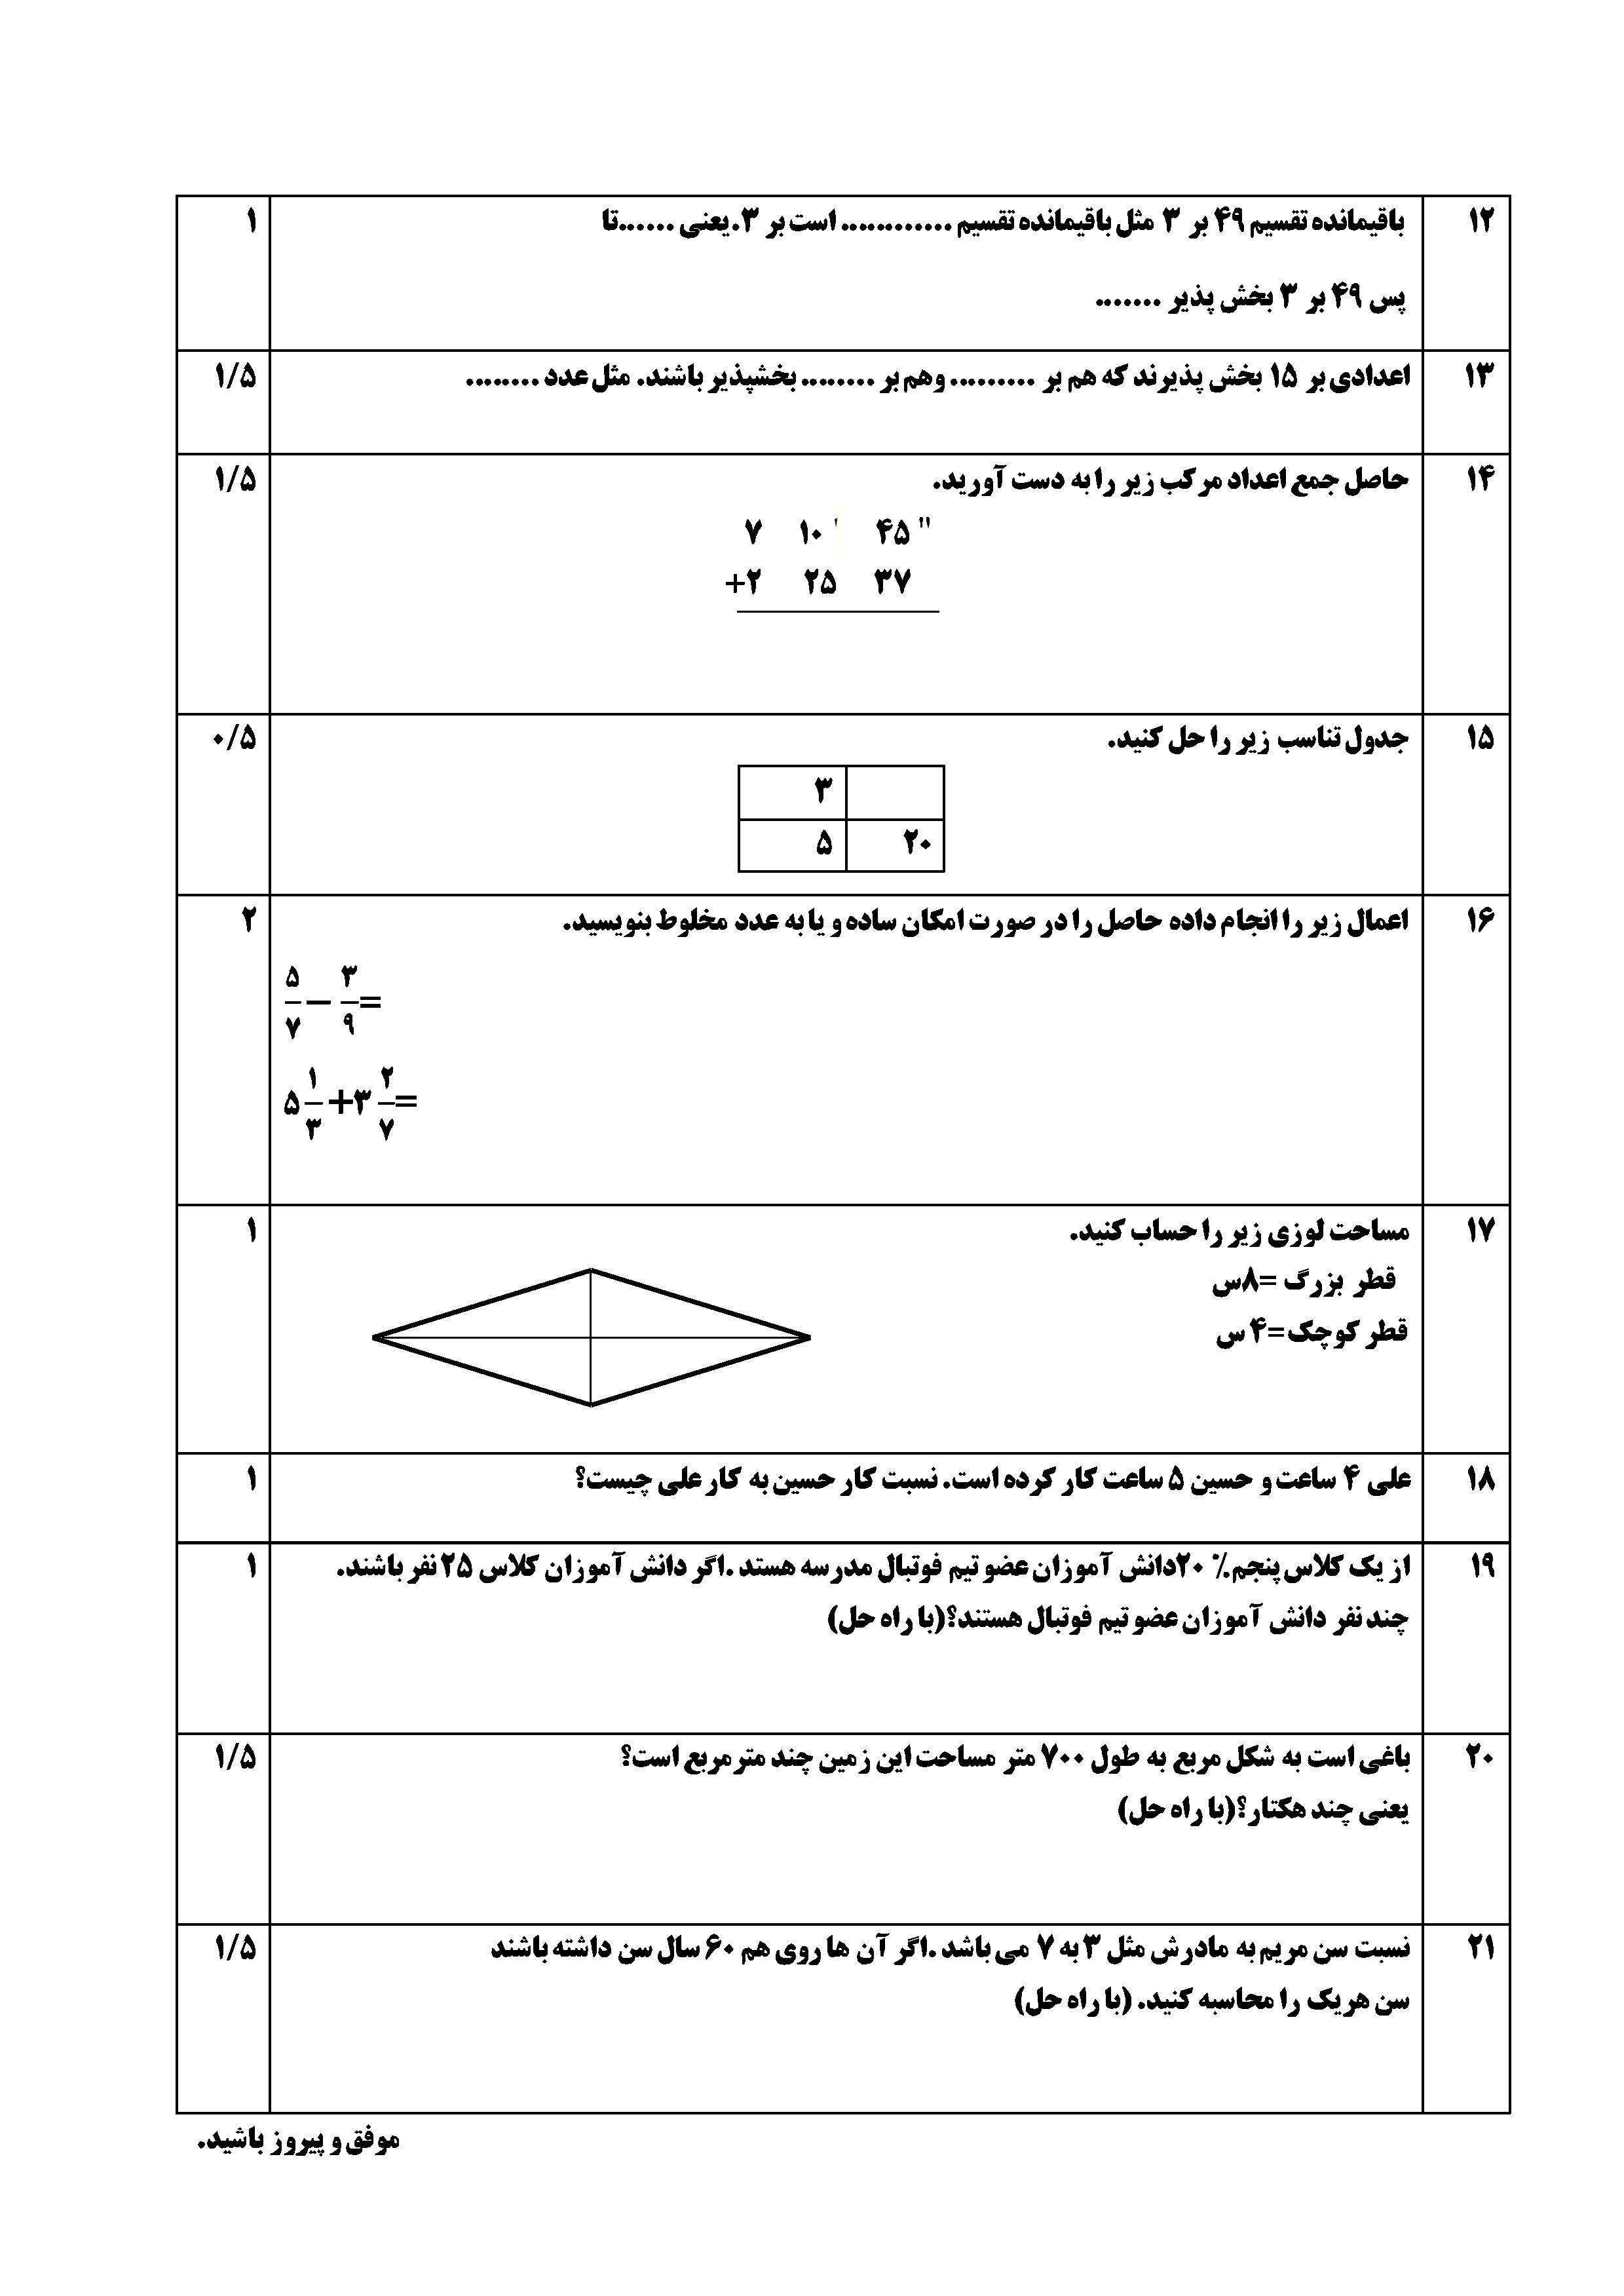 صفحه دوم ریاضی نوبت اول